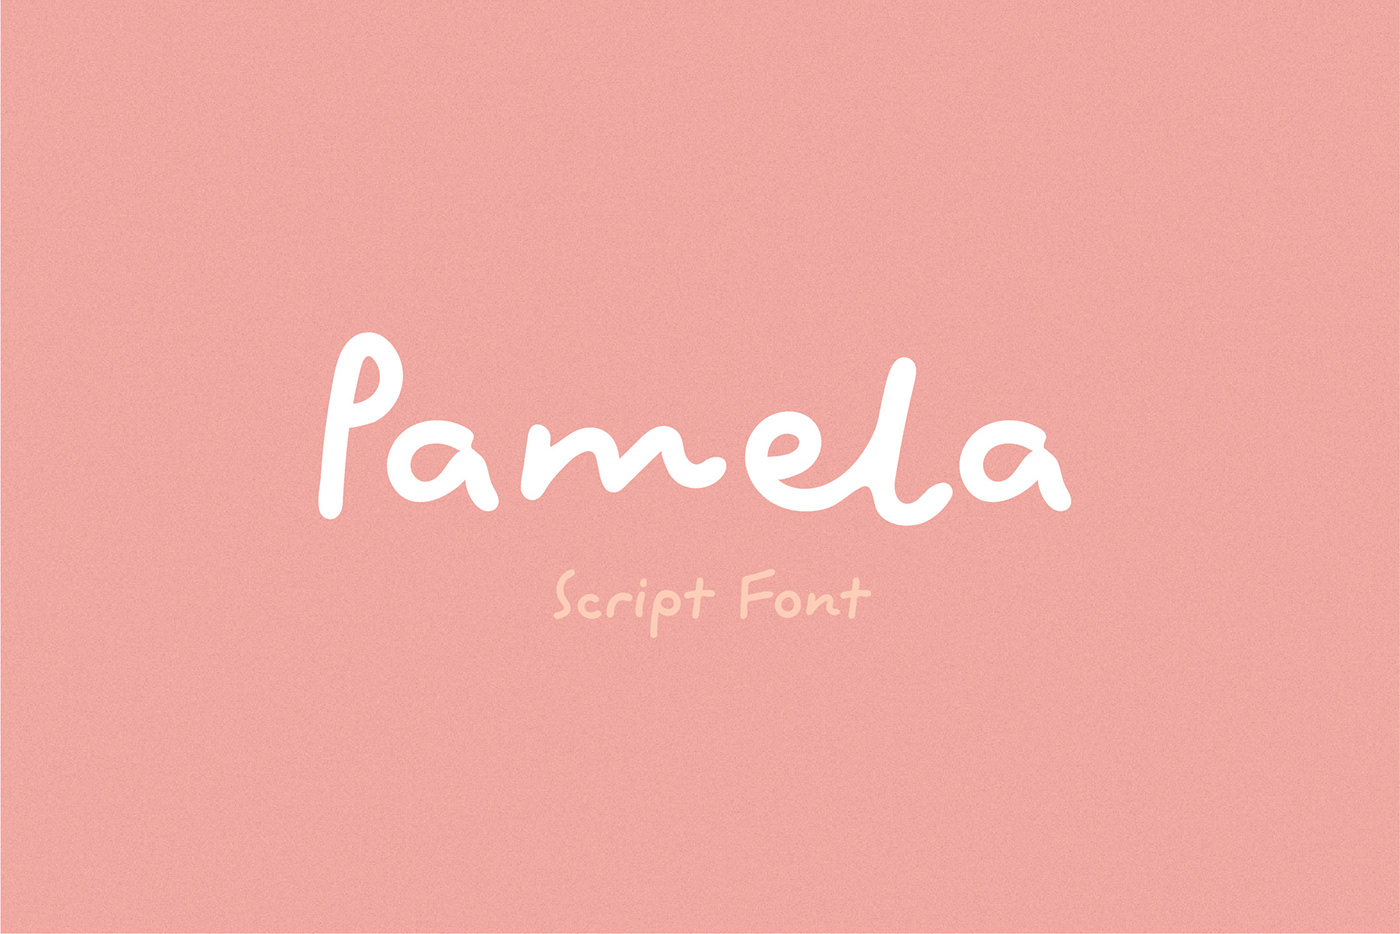 Pamela Free Font - script